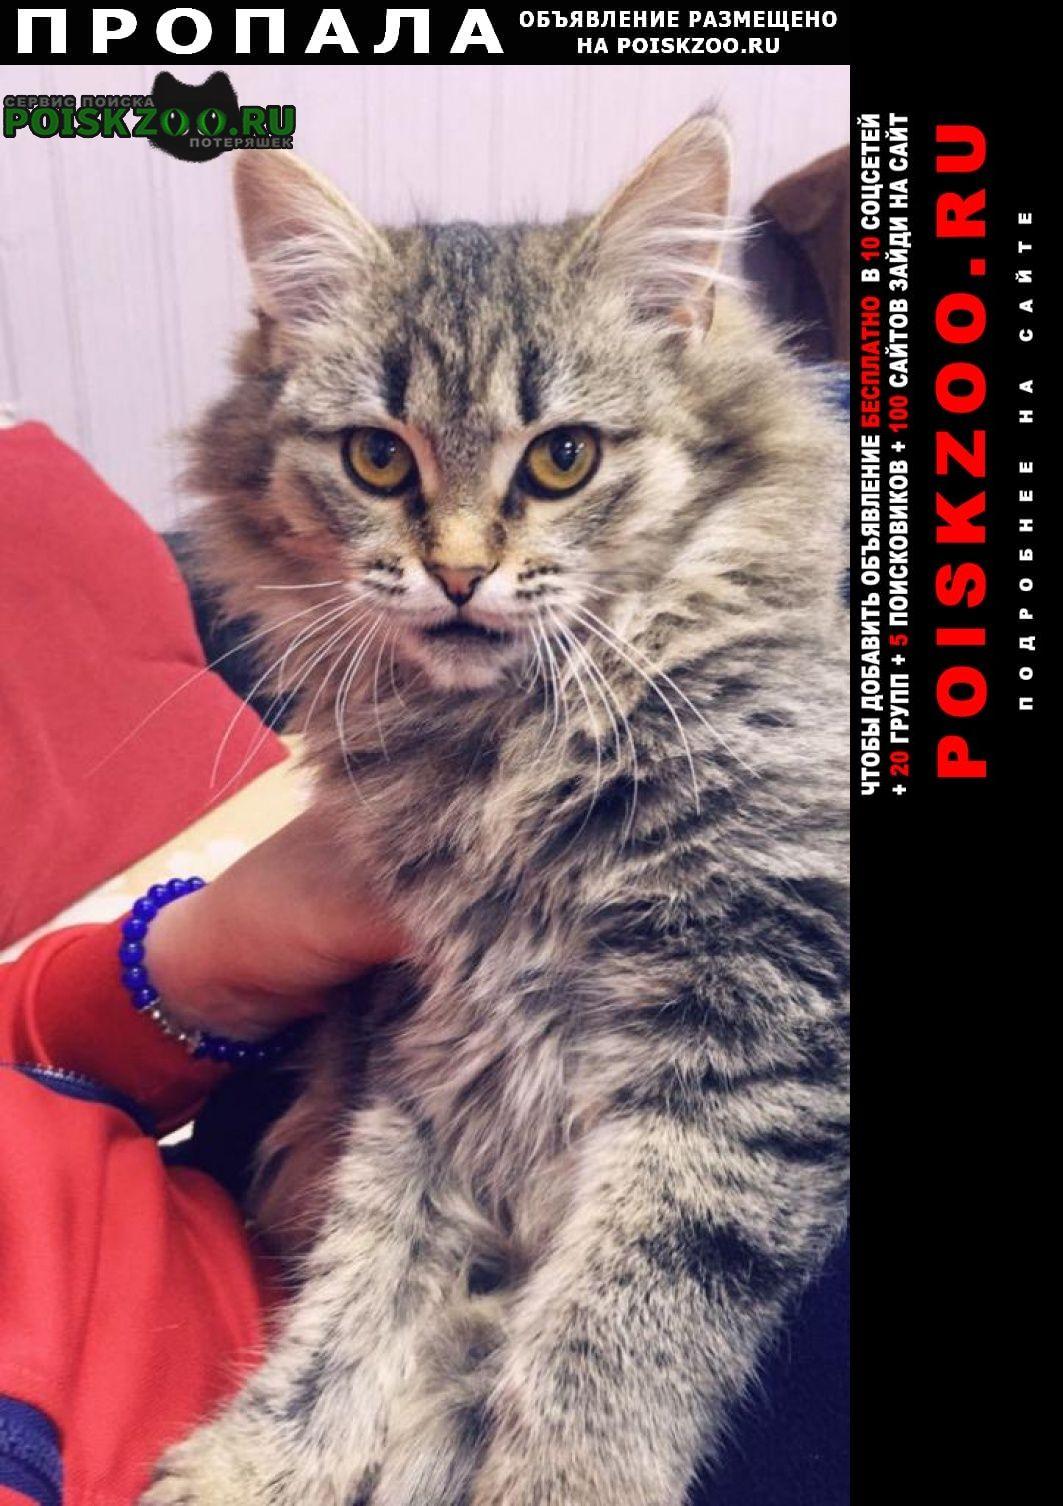 Пропала кошка помогите найти Звенигород